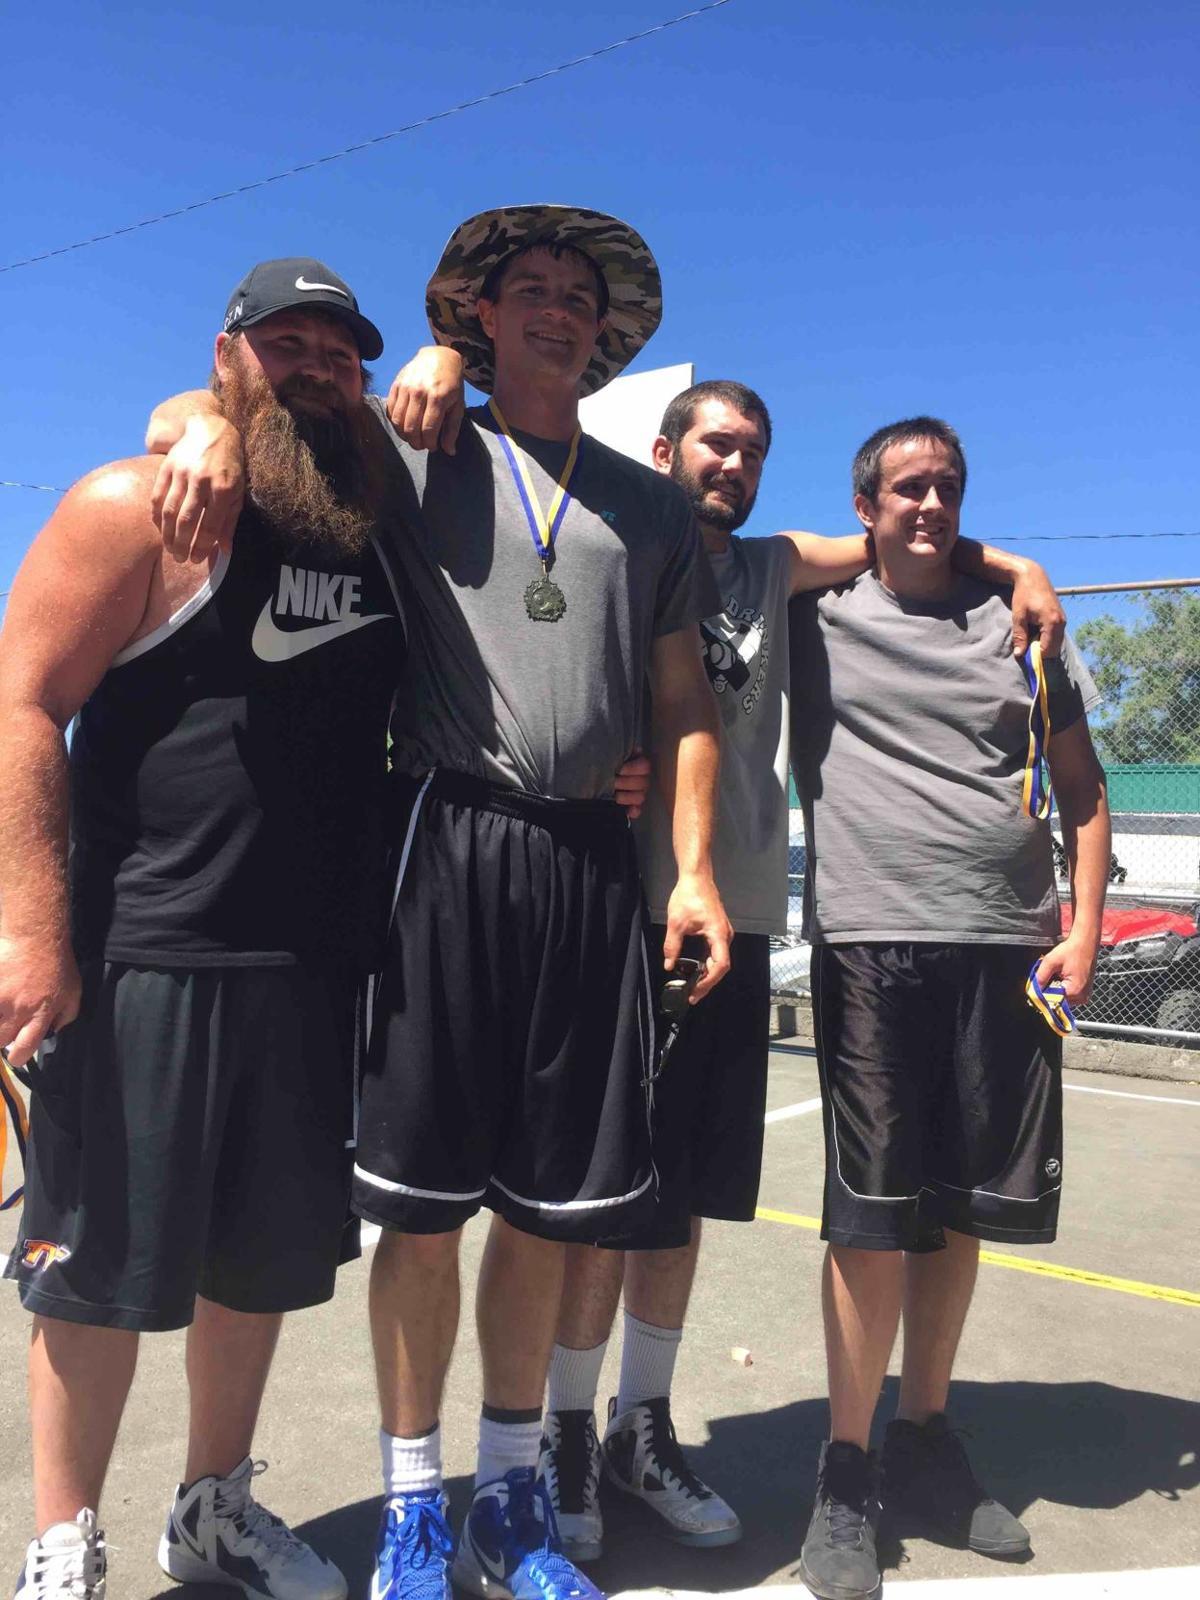 Prairie Day basketball tournament